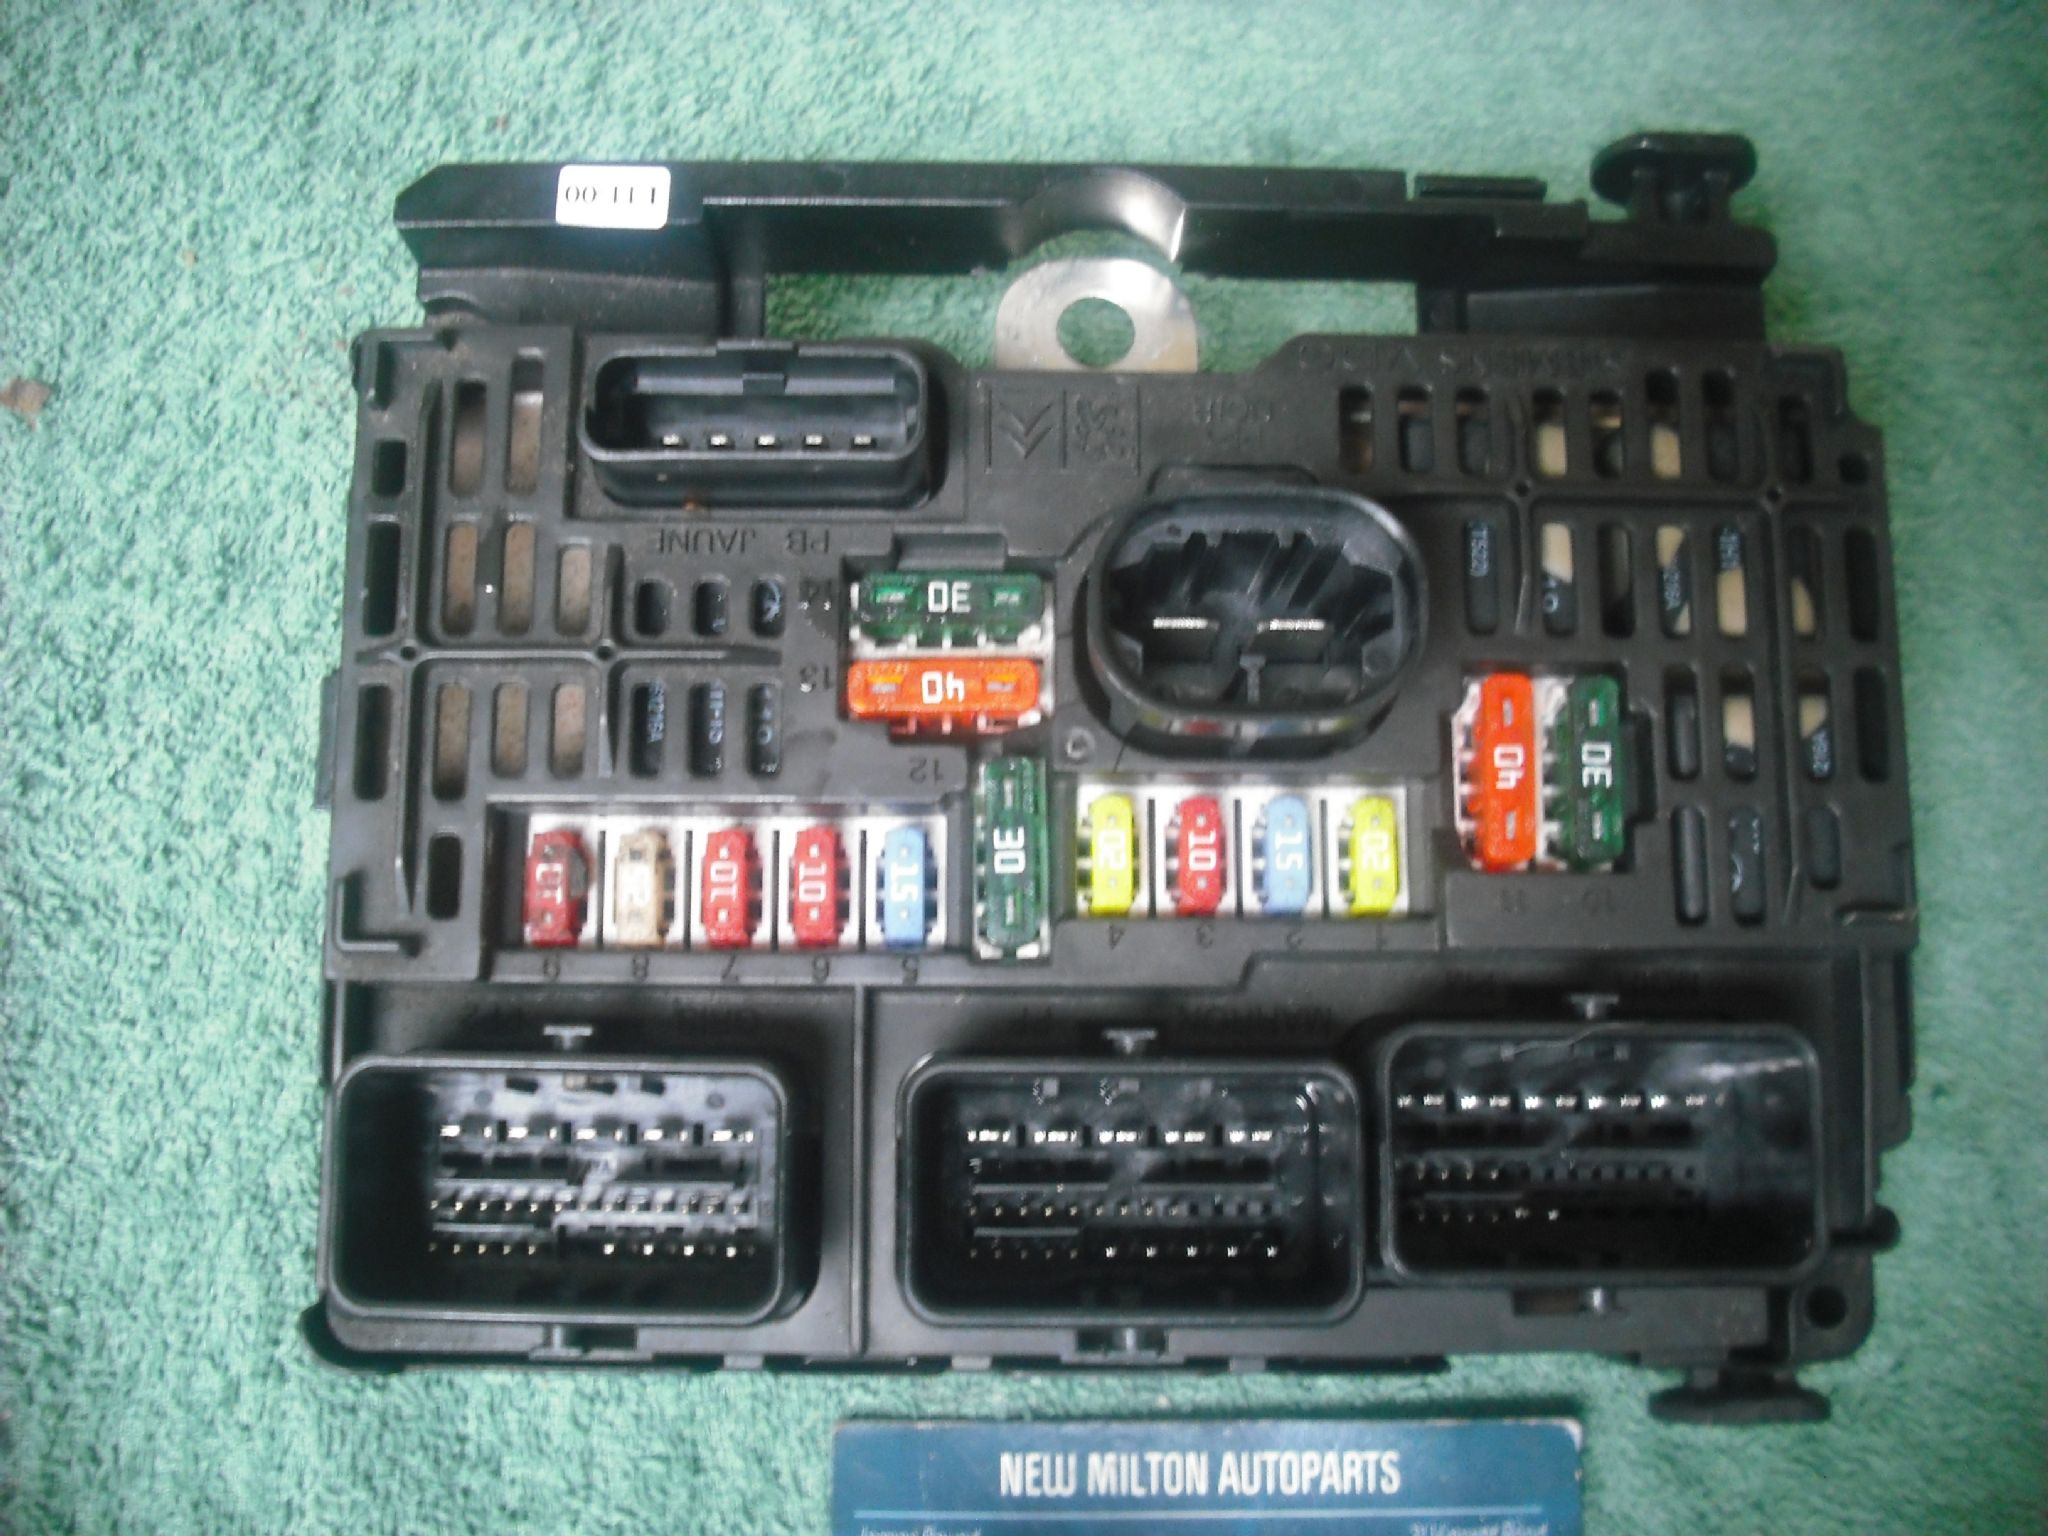 DR_0973] Citroen C4 Grand Picasso Fuse Box Fault Download Diagram | Citroen C4 Fuse Box Fault |  | Pala Lotap Shollo Librar Wiring 101